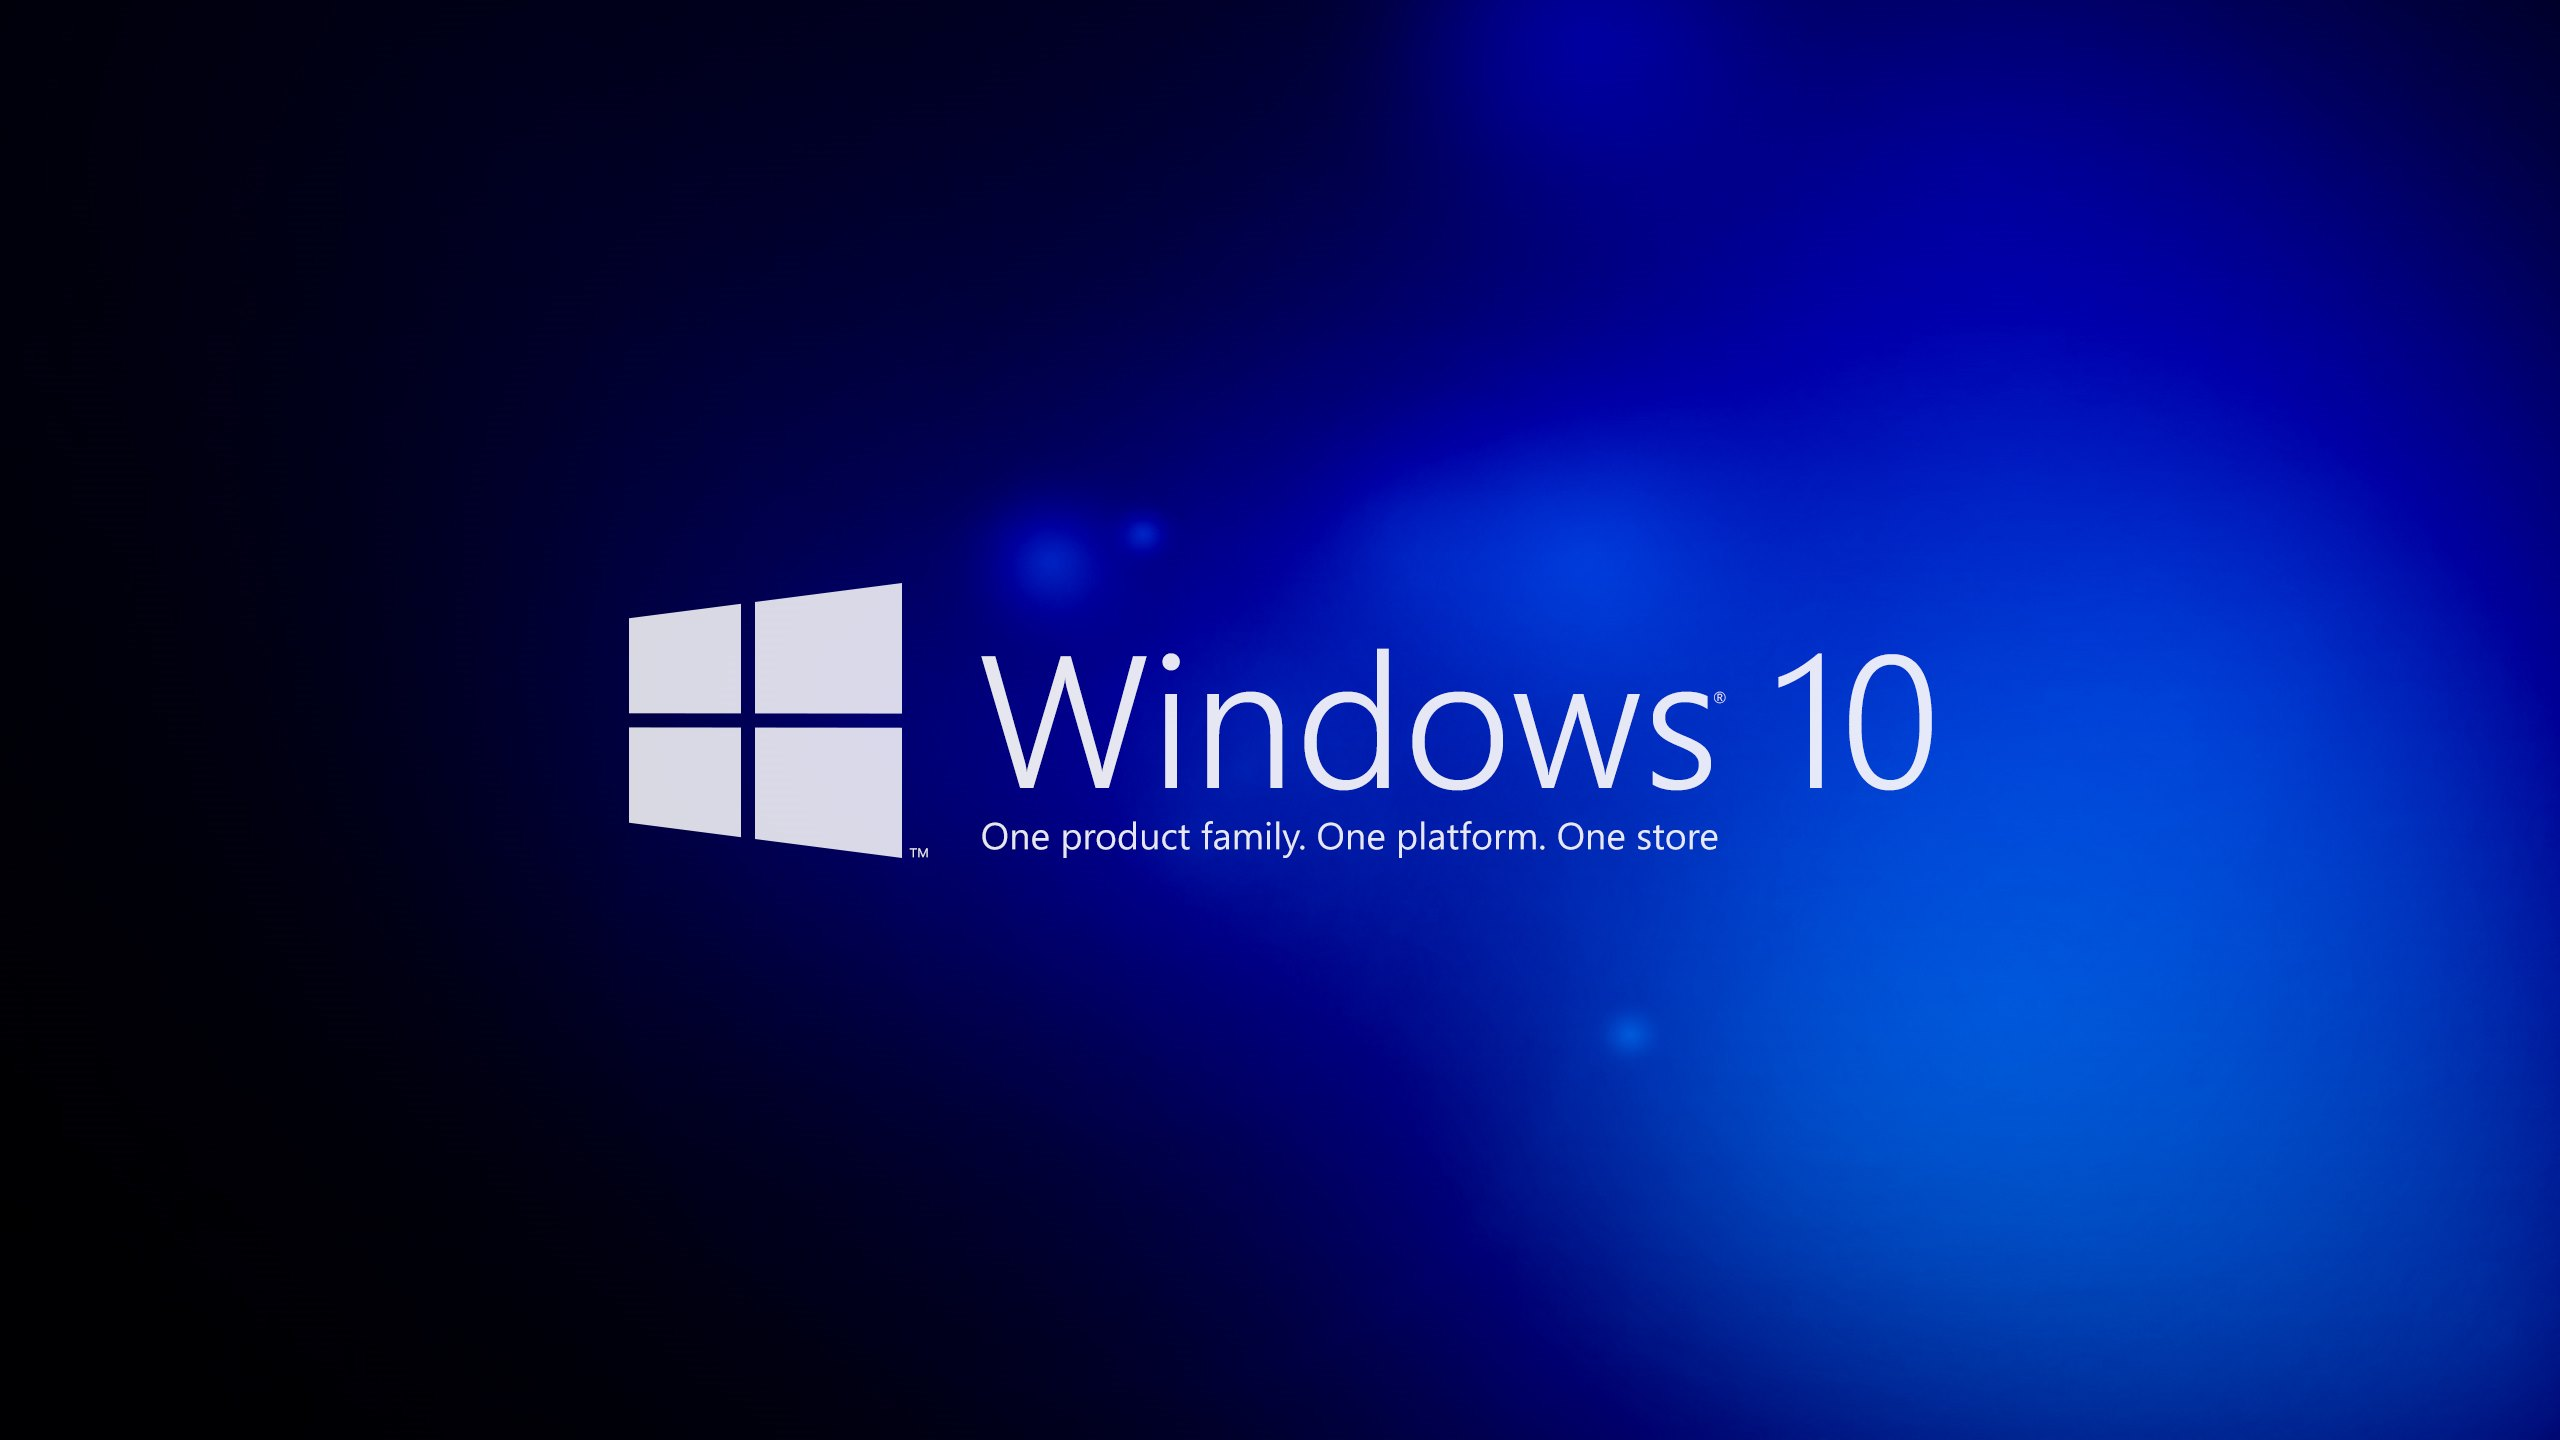 windows 10 Computer Wallpapers Desktop Backgrounds 2560x1440 ID 2560x1440